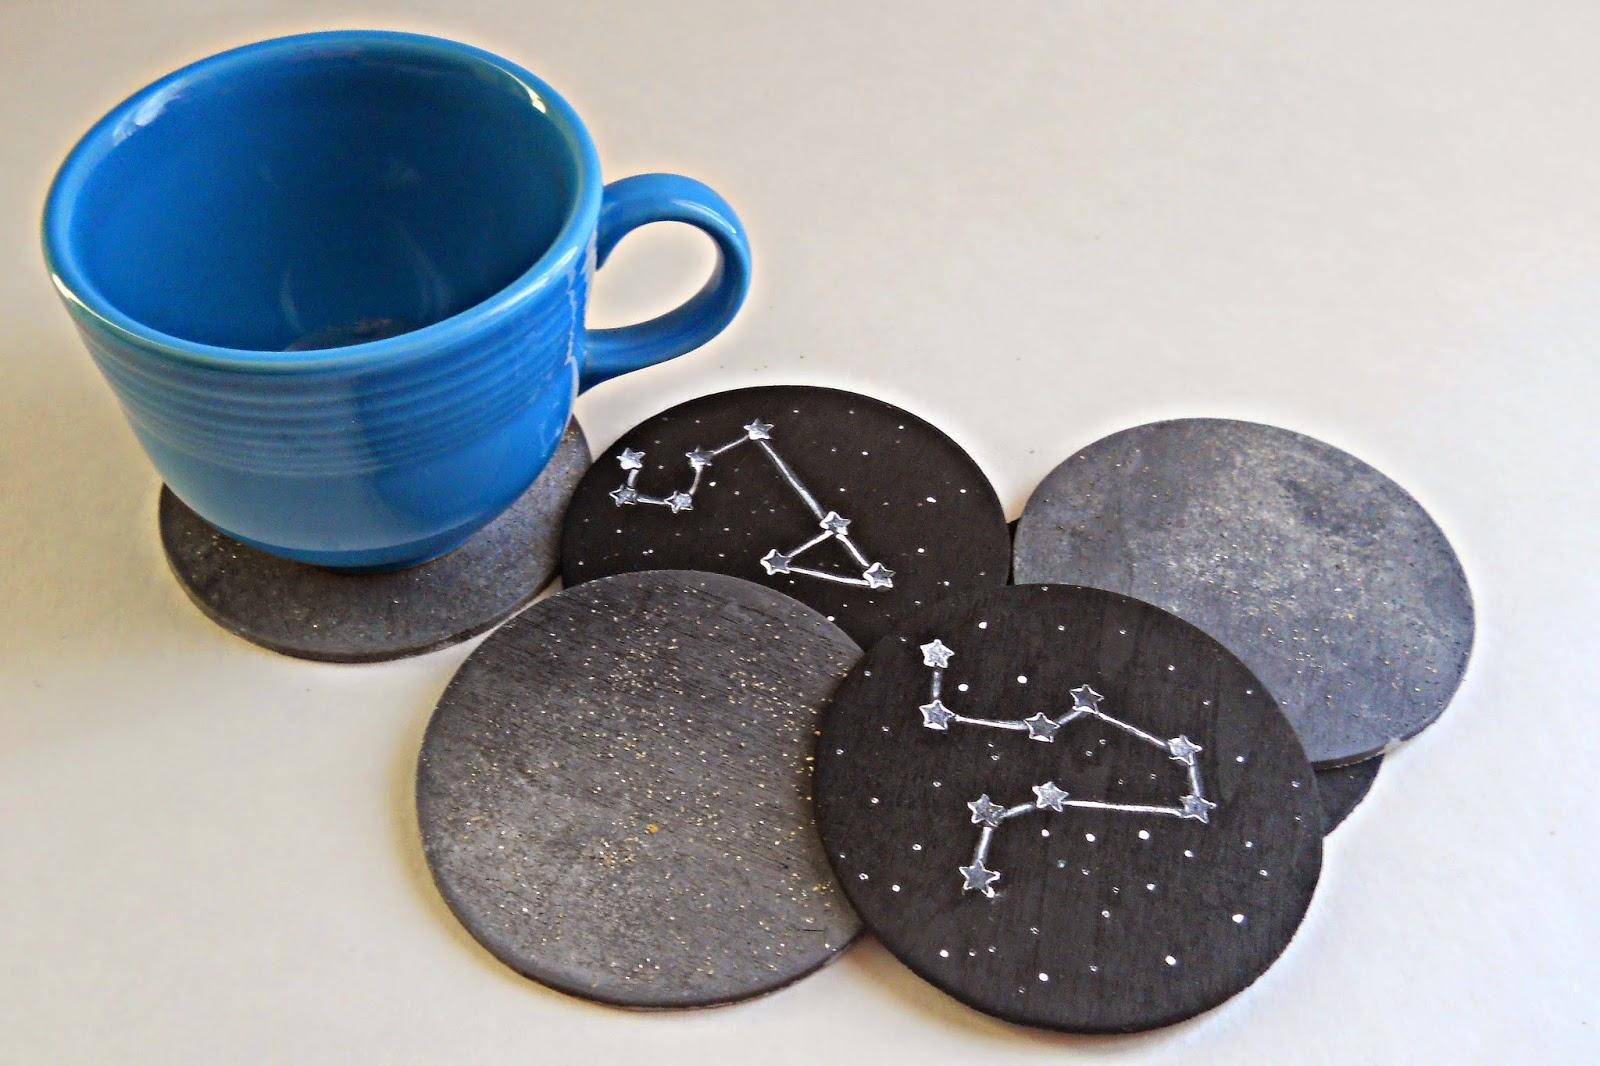 DIY chalkboard constellation coasters